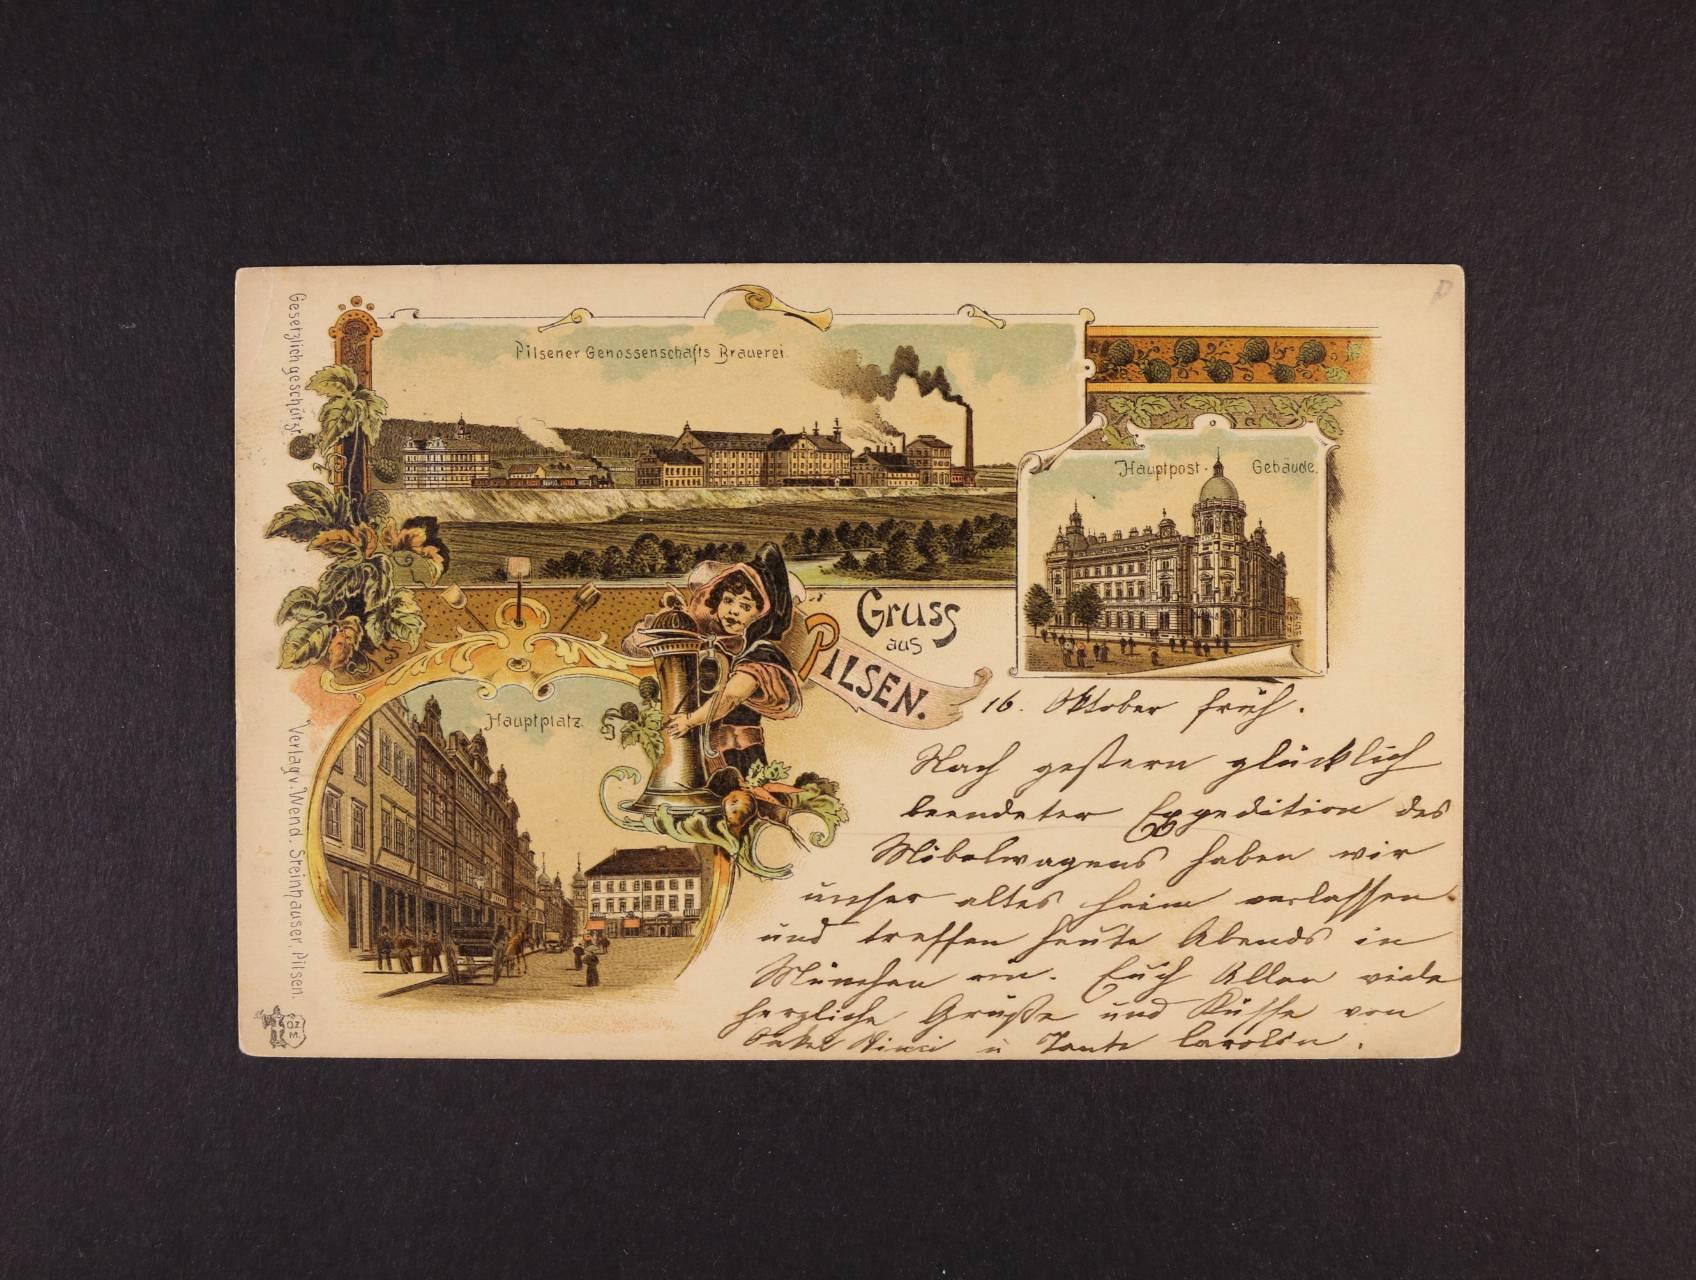 Plzeň - bar. litograf. koláž, dl. adresa, použitá 1897, velmi dobrá kvalita